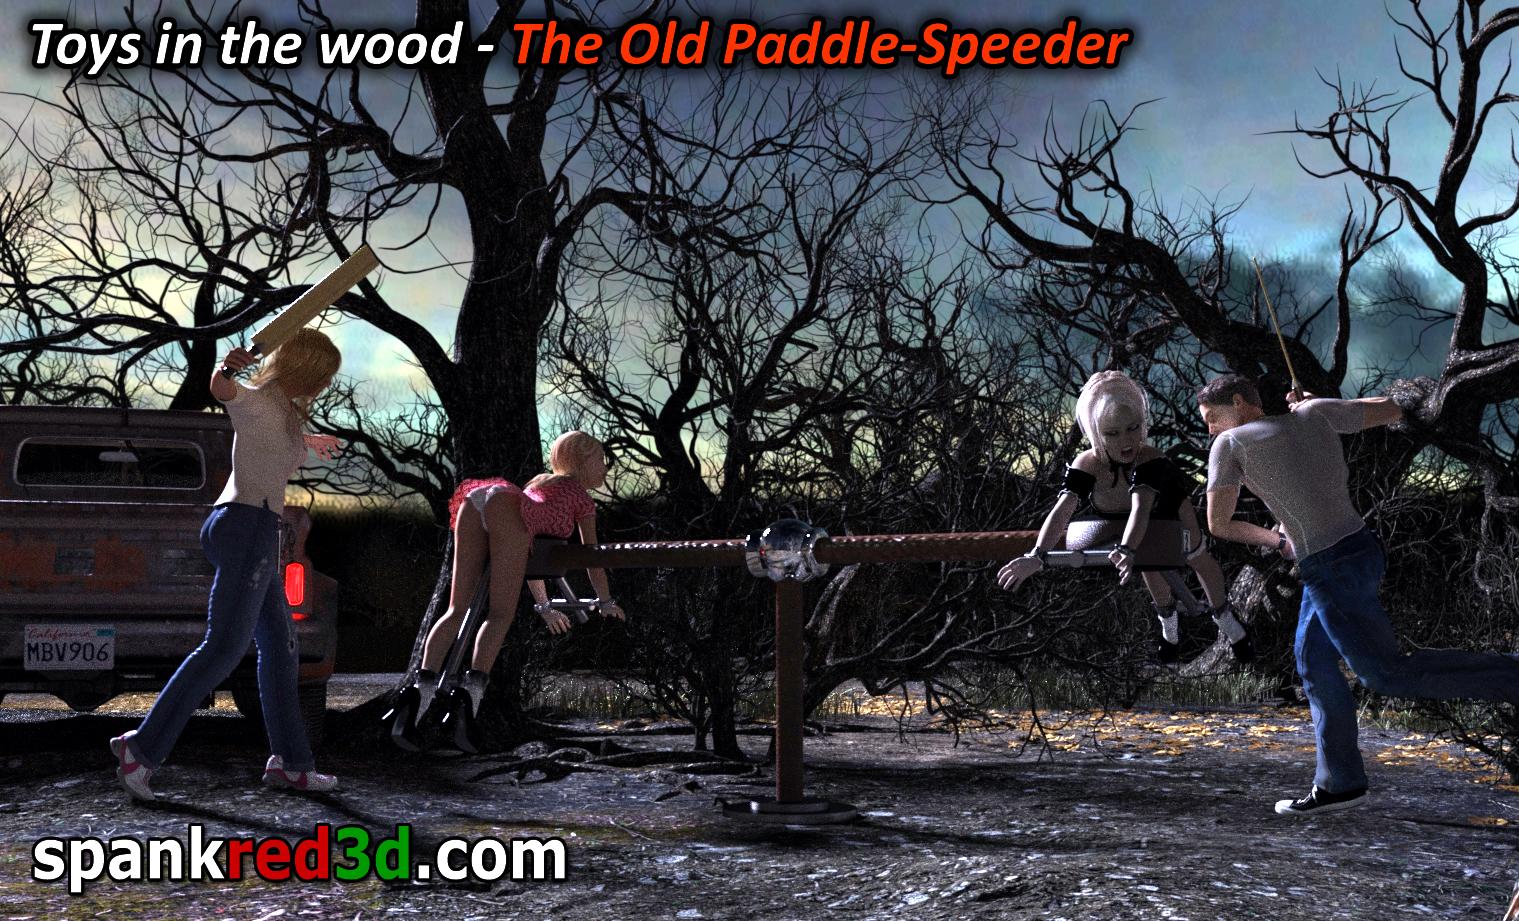 Otdoor paddling spanked Paddle Speeder